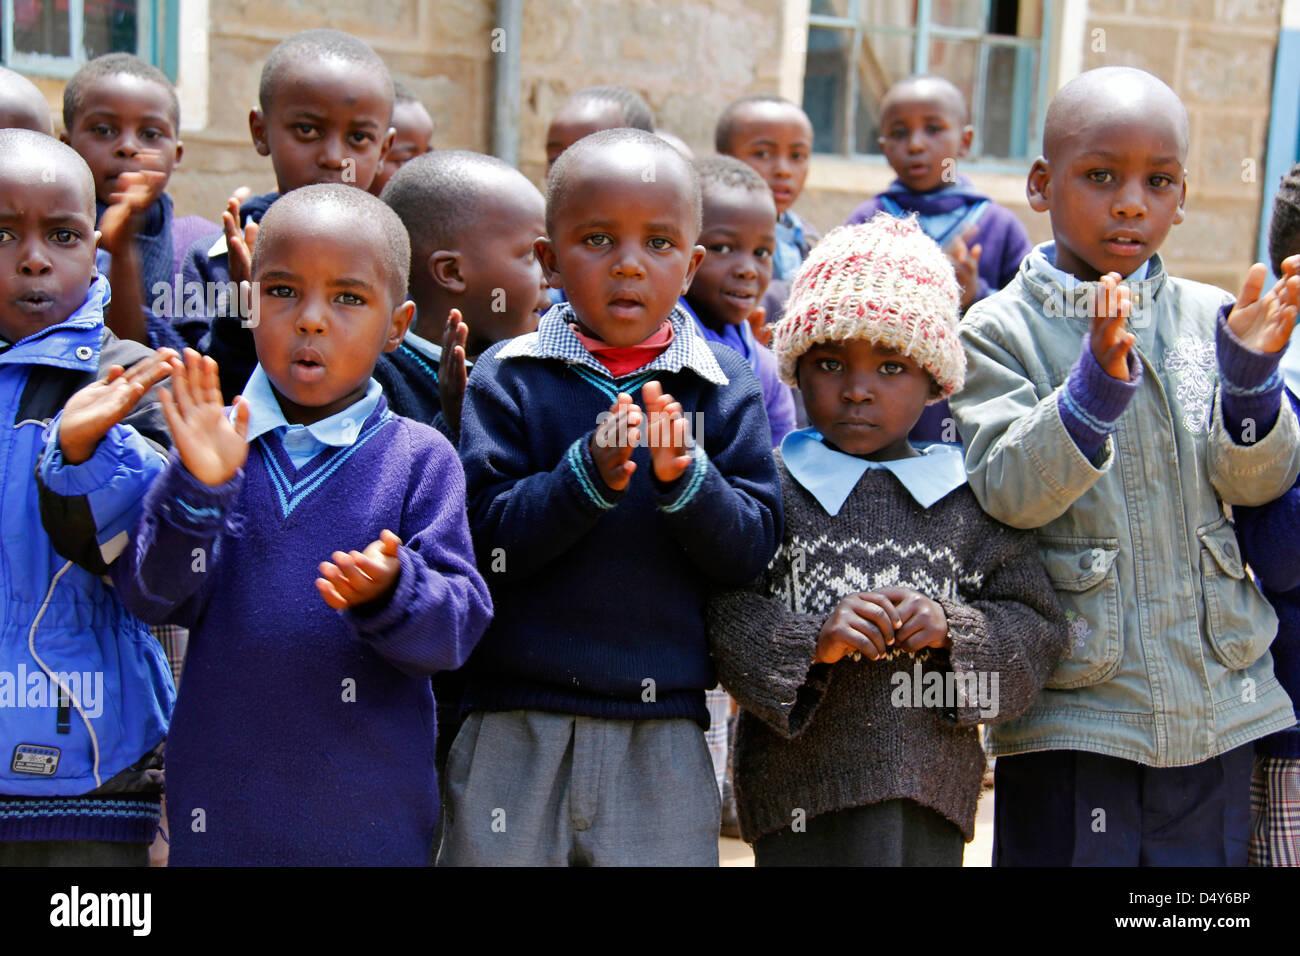 Africa, Kenya, Nanyuki. School children of the Nanyuki Children's Home. - Stock Image